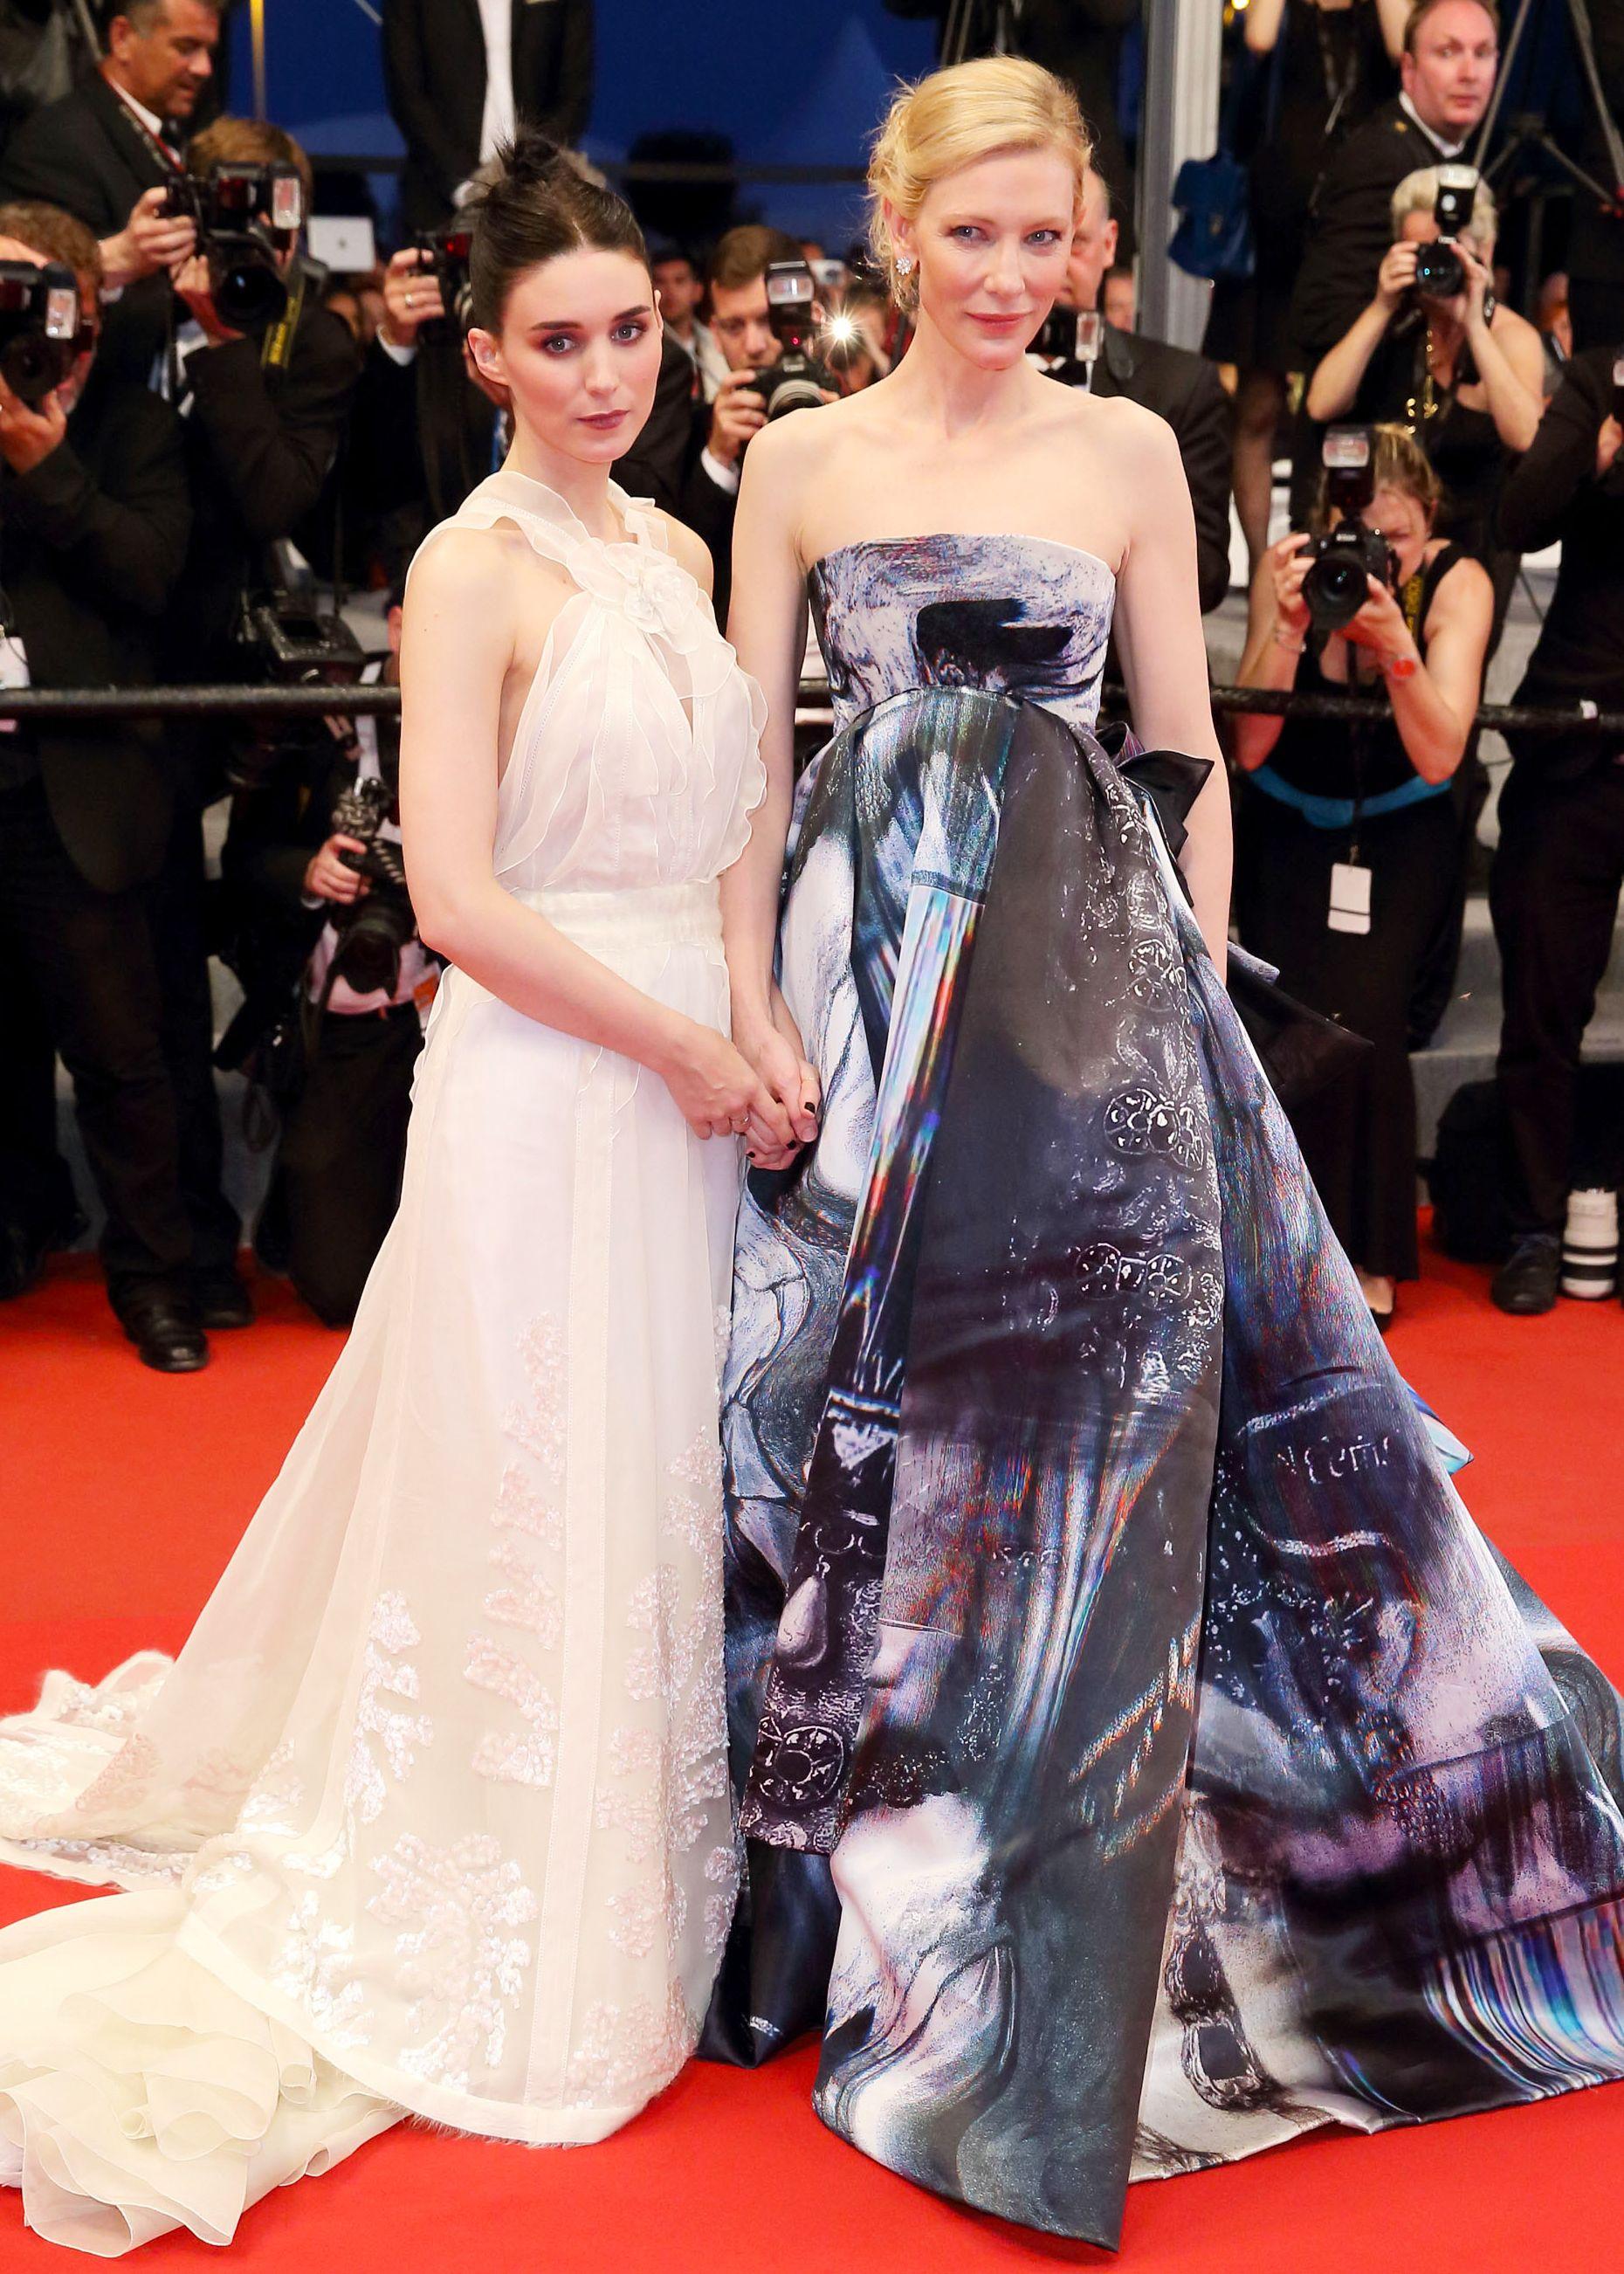 Cate Blanchett And Rooney Mara S Best Carol Press Tour Looks Red Carpet Looks Red Carpet Dresses Cate Blanchett